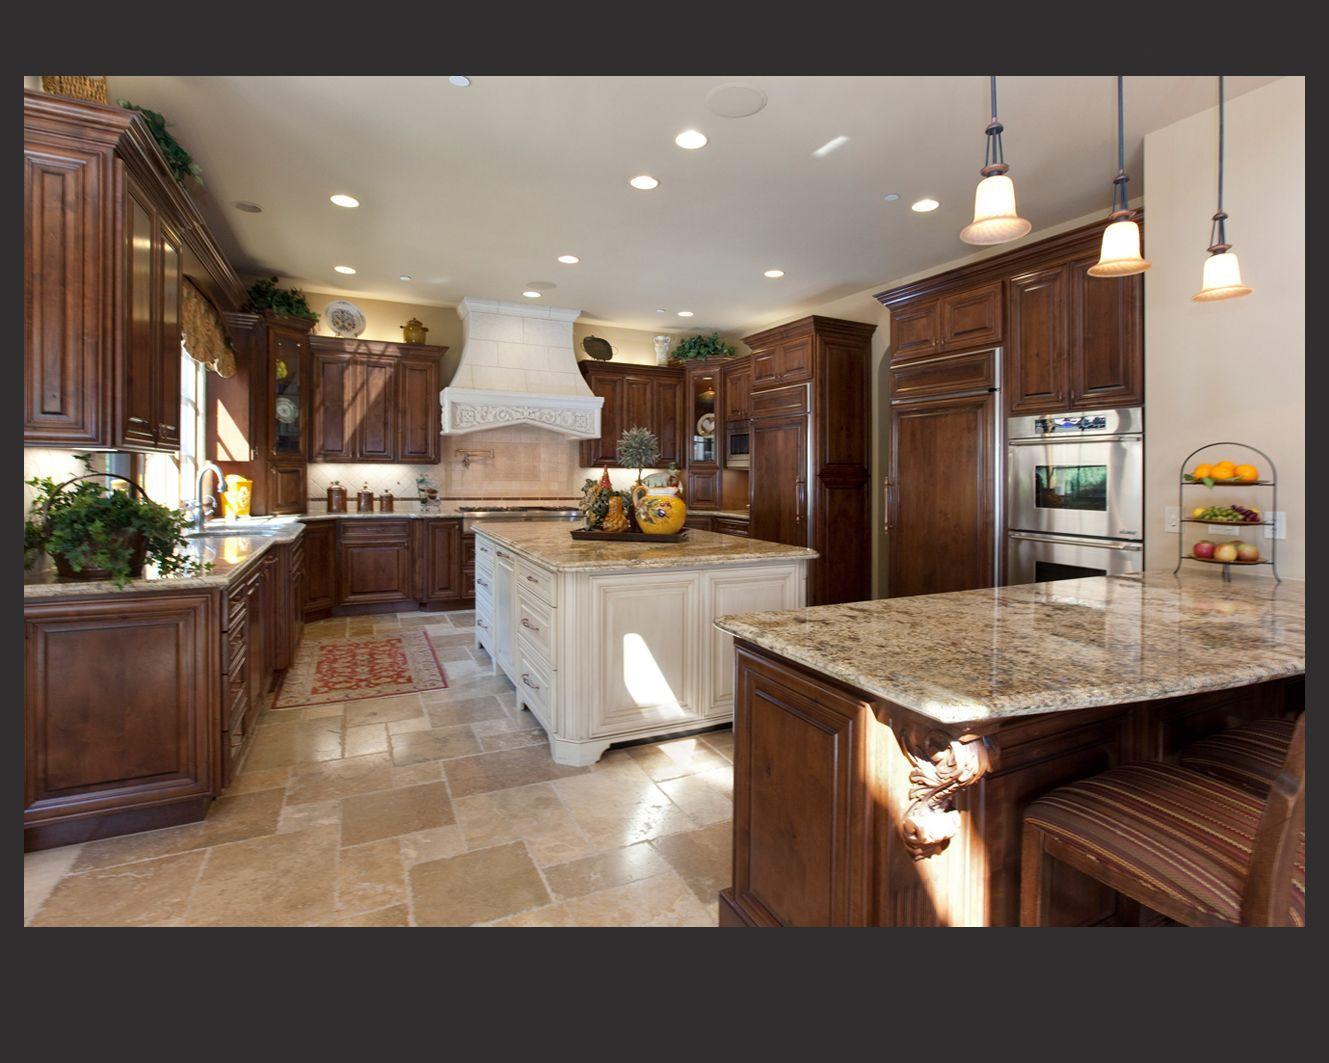 25 Wonderful Light Hardwood Floors With Dark Kitchen Cabinets Unique Flooring Ideas